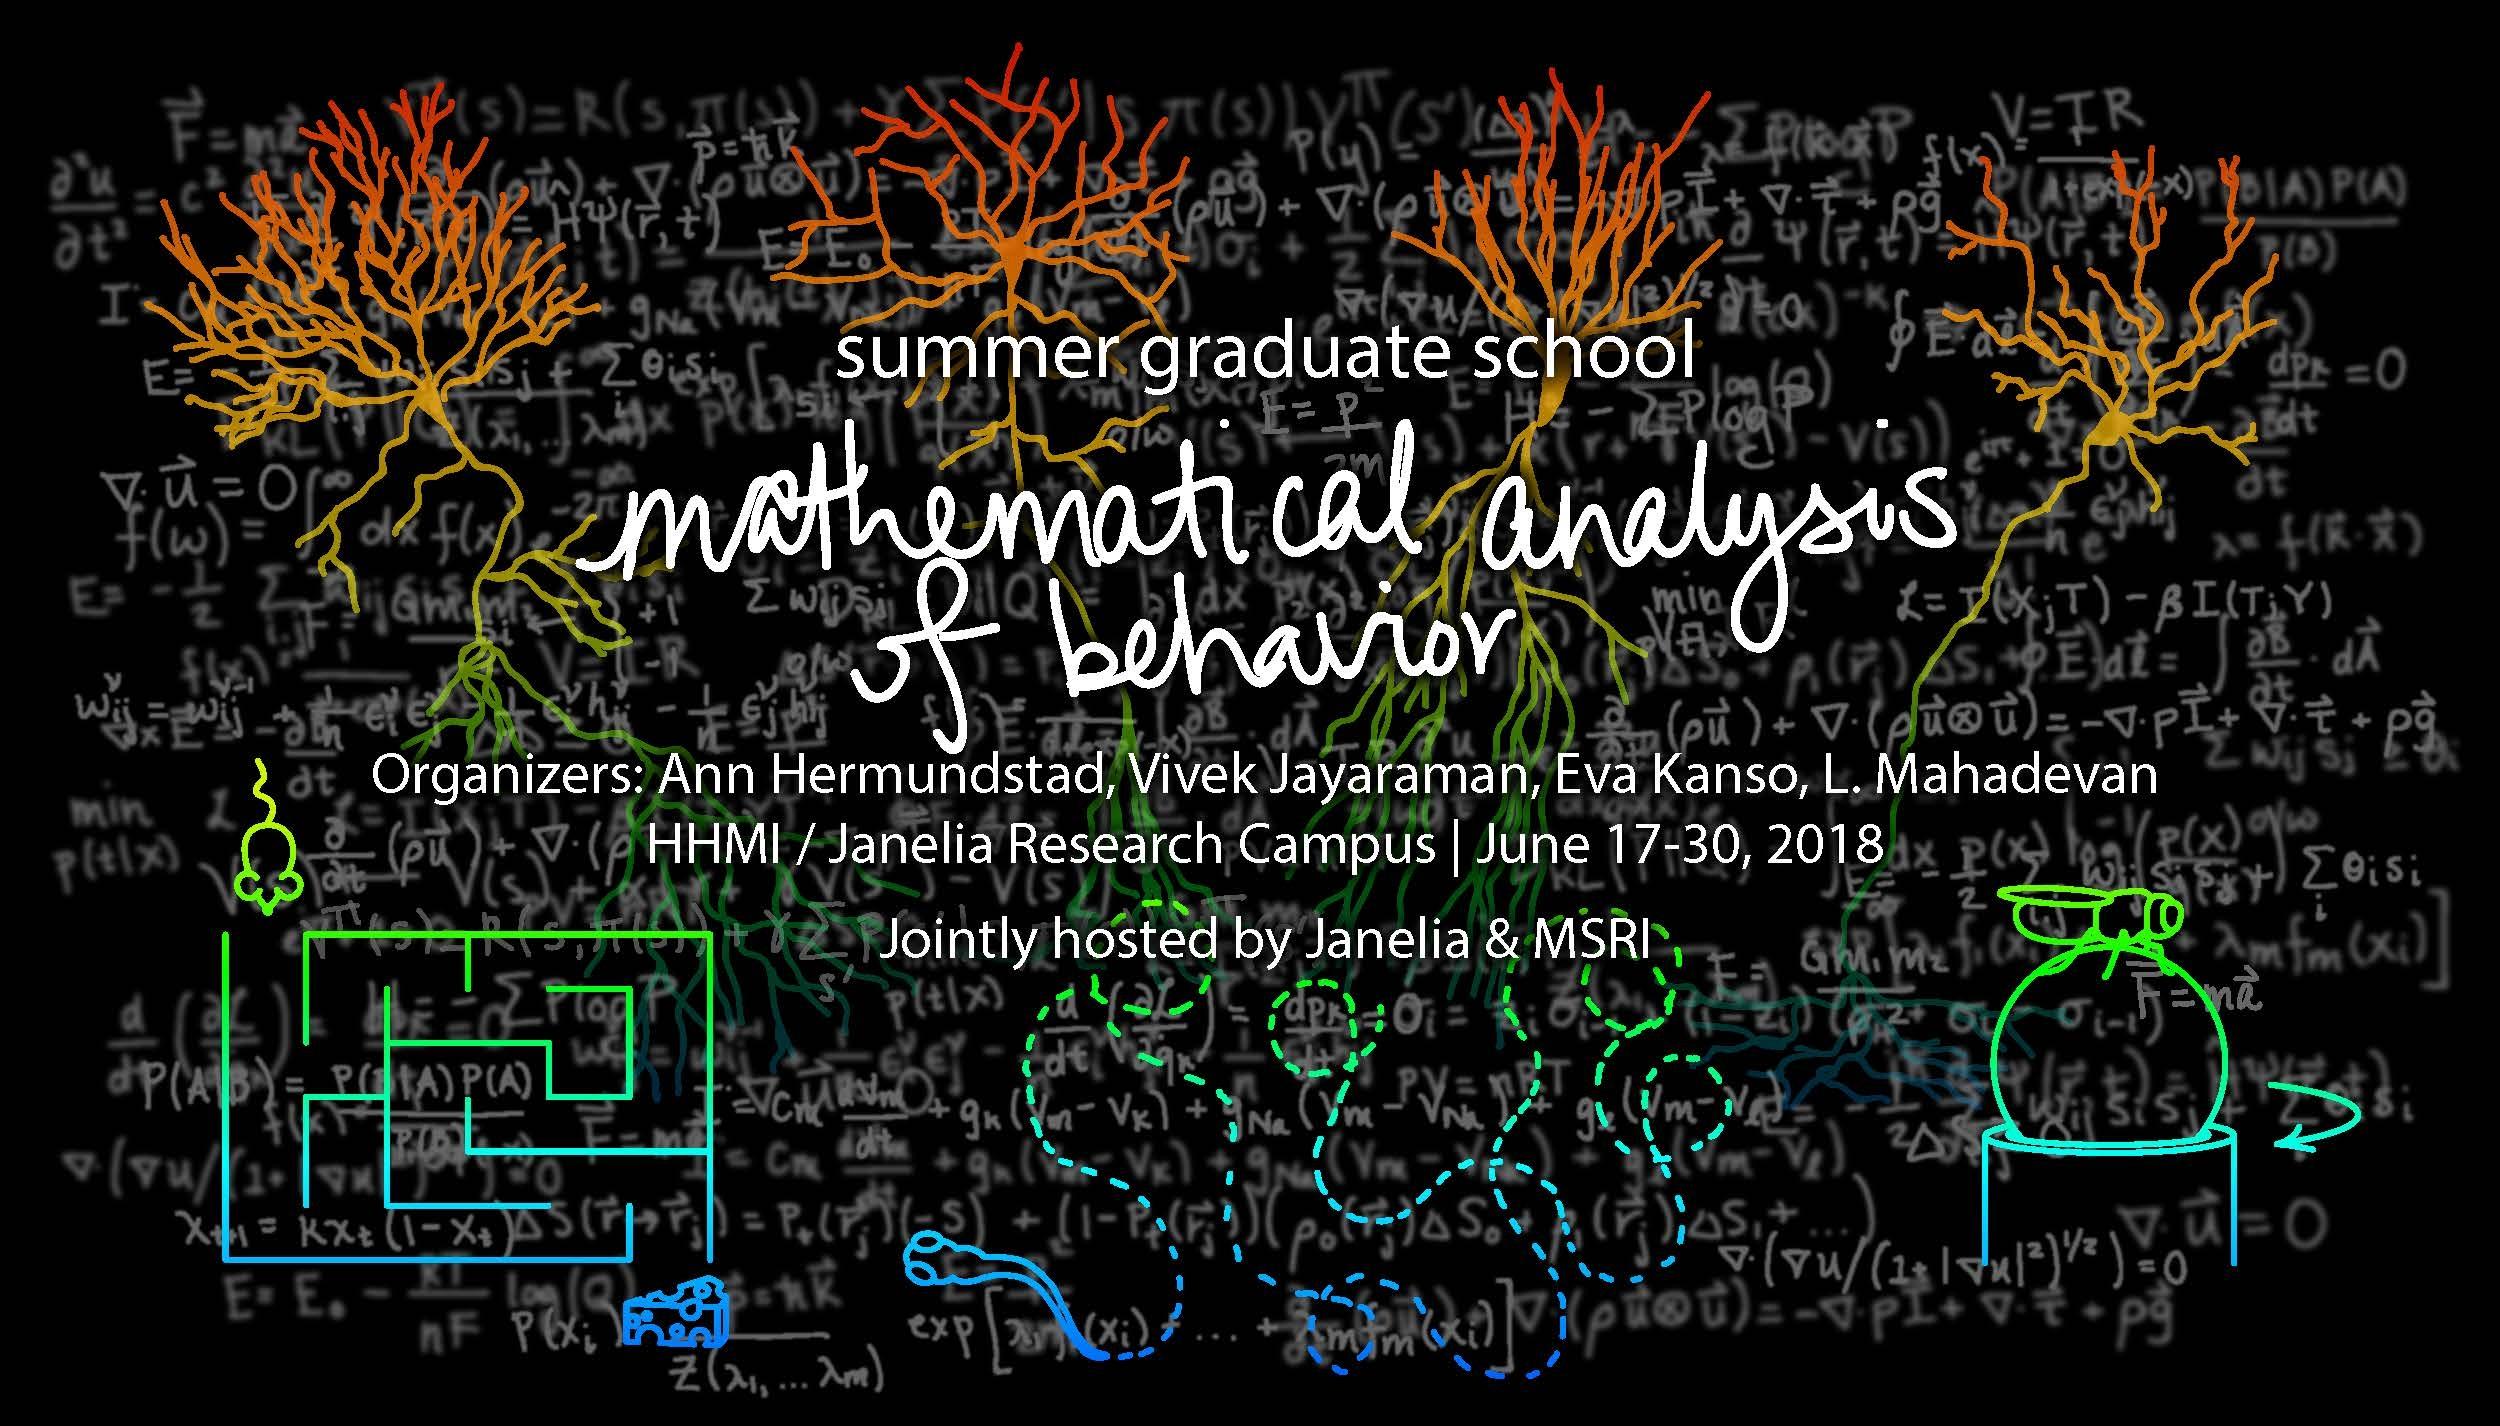 Summer Graduate School on Mathematical Analysis of Behavior